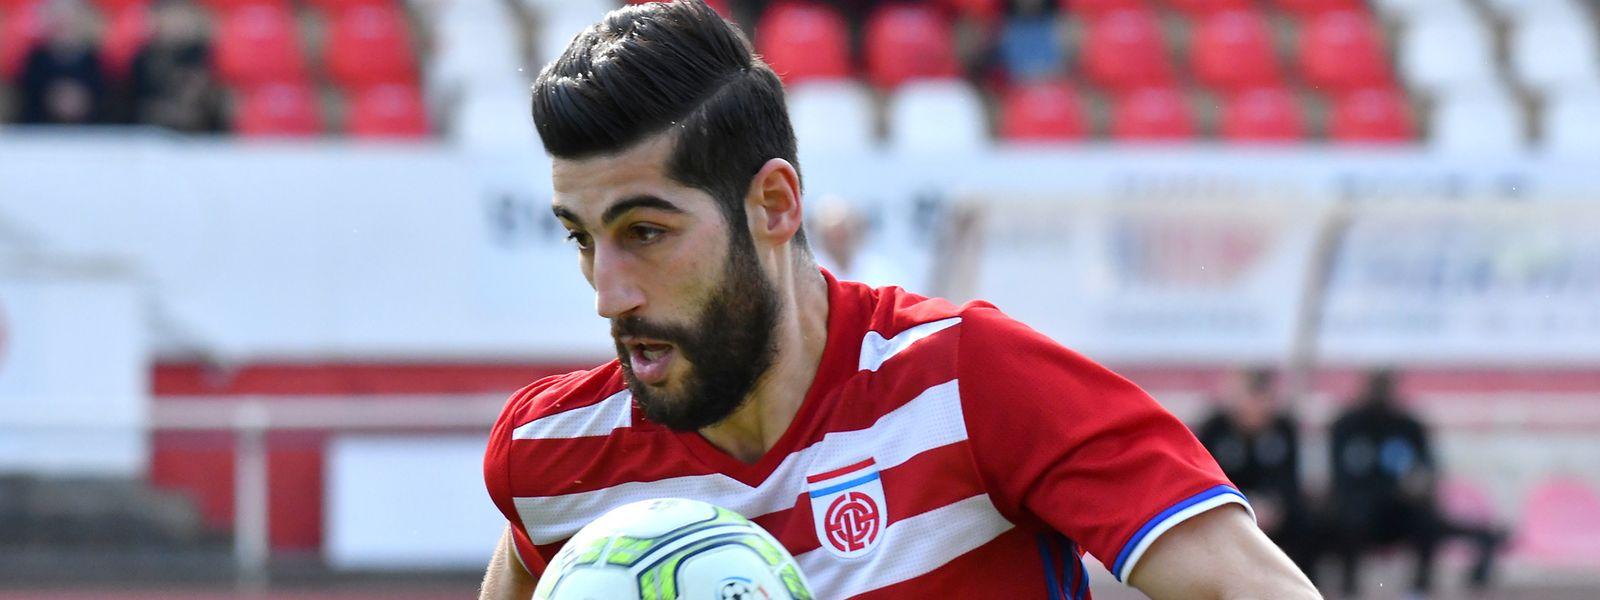 Samir Hadji geht künftig in Belgien auf Torejagd.